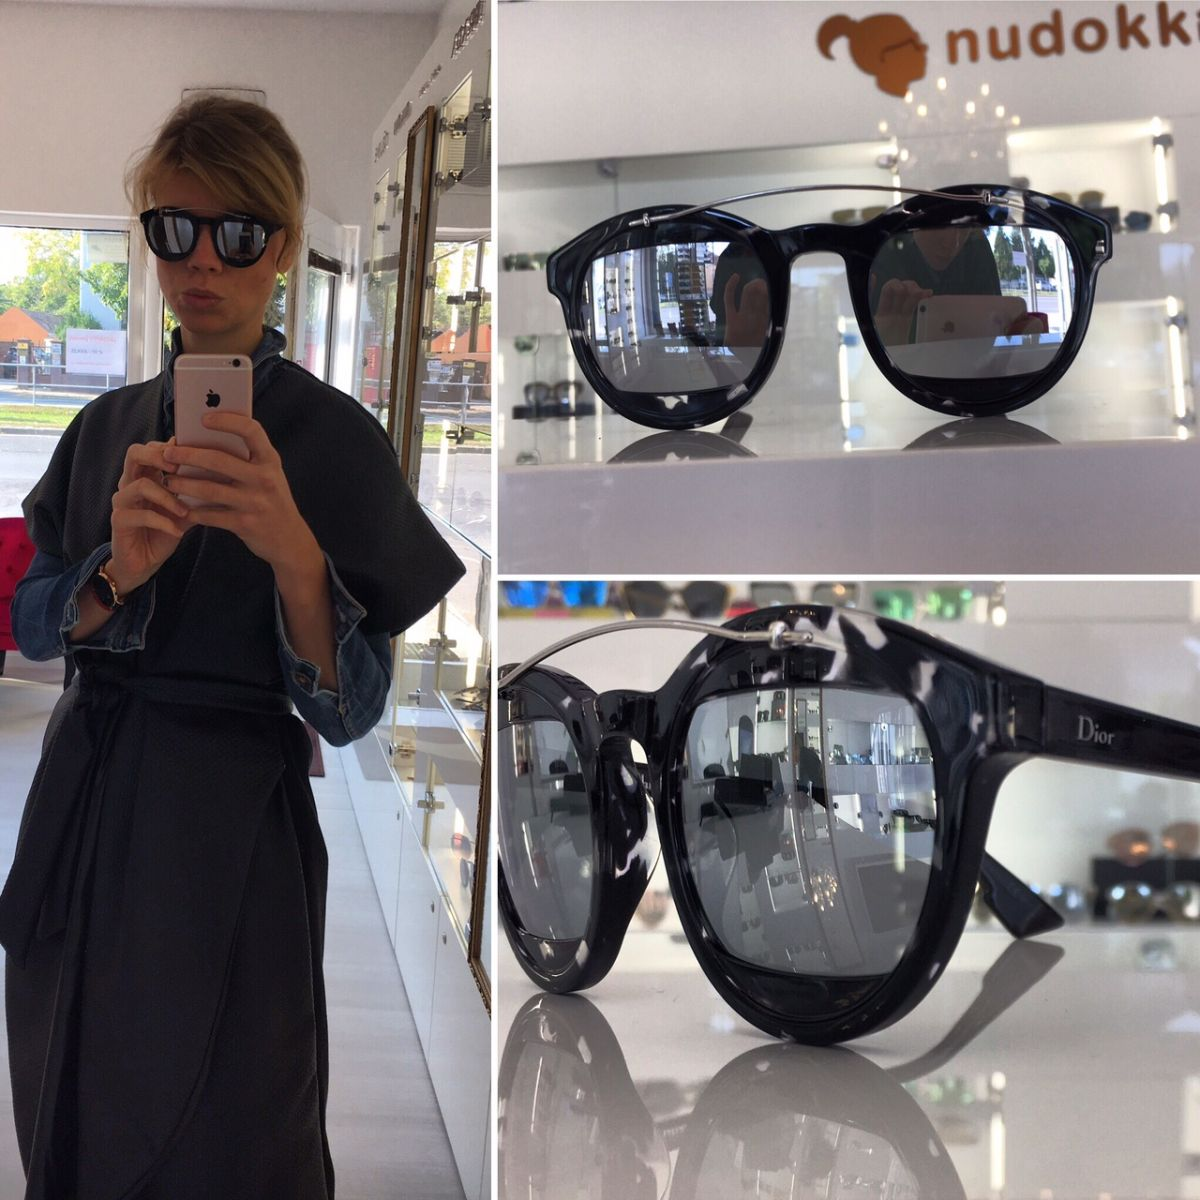 slnečné okuliare Dior. optika Nudokki - značkové okulire Dior 95ec2818a49